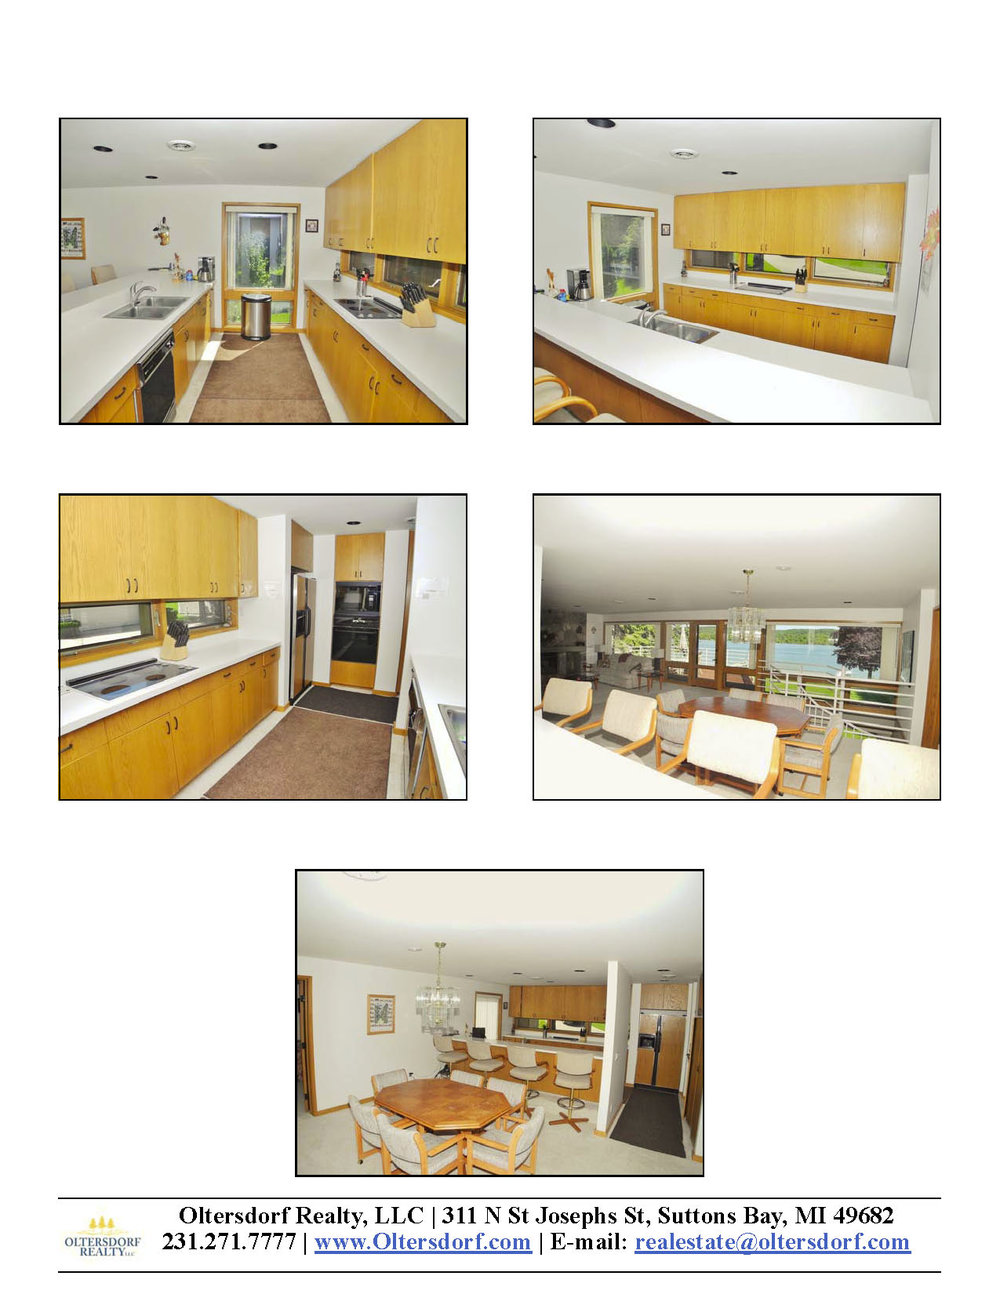 2091 S Lake Shore Drive - Oltersdorf Realty LLC Marketing Packet_Page_05.jpg